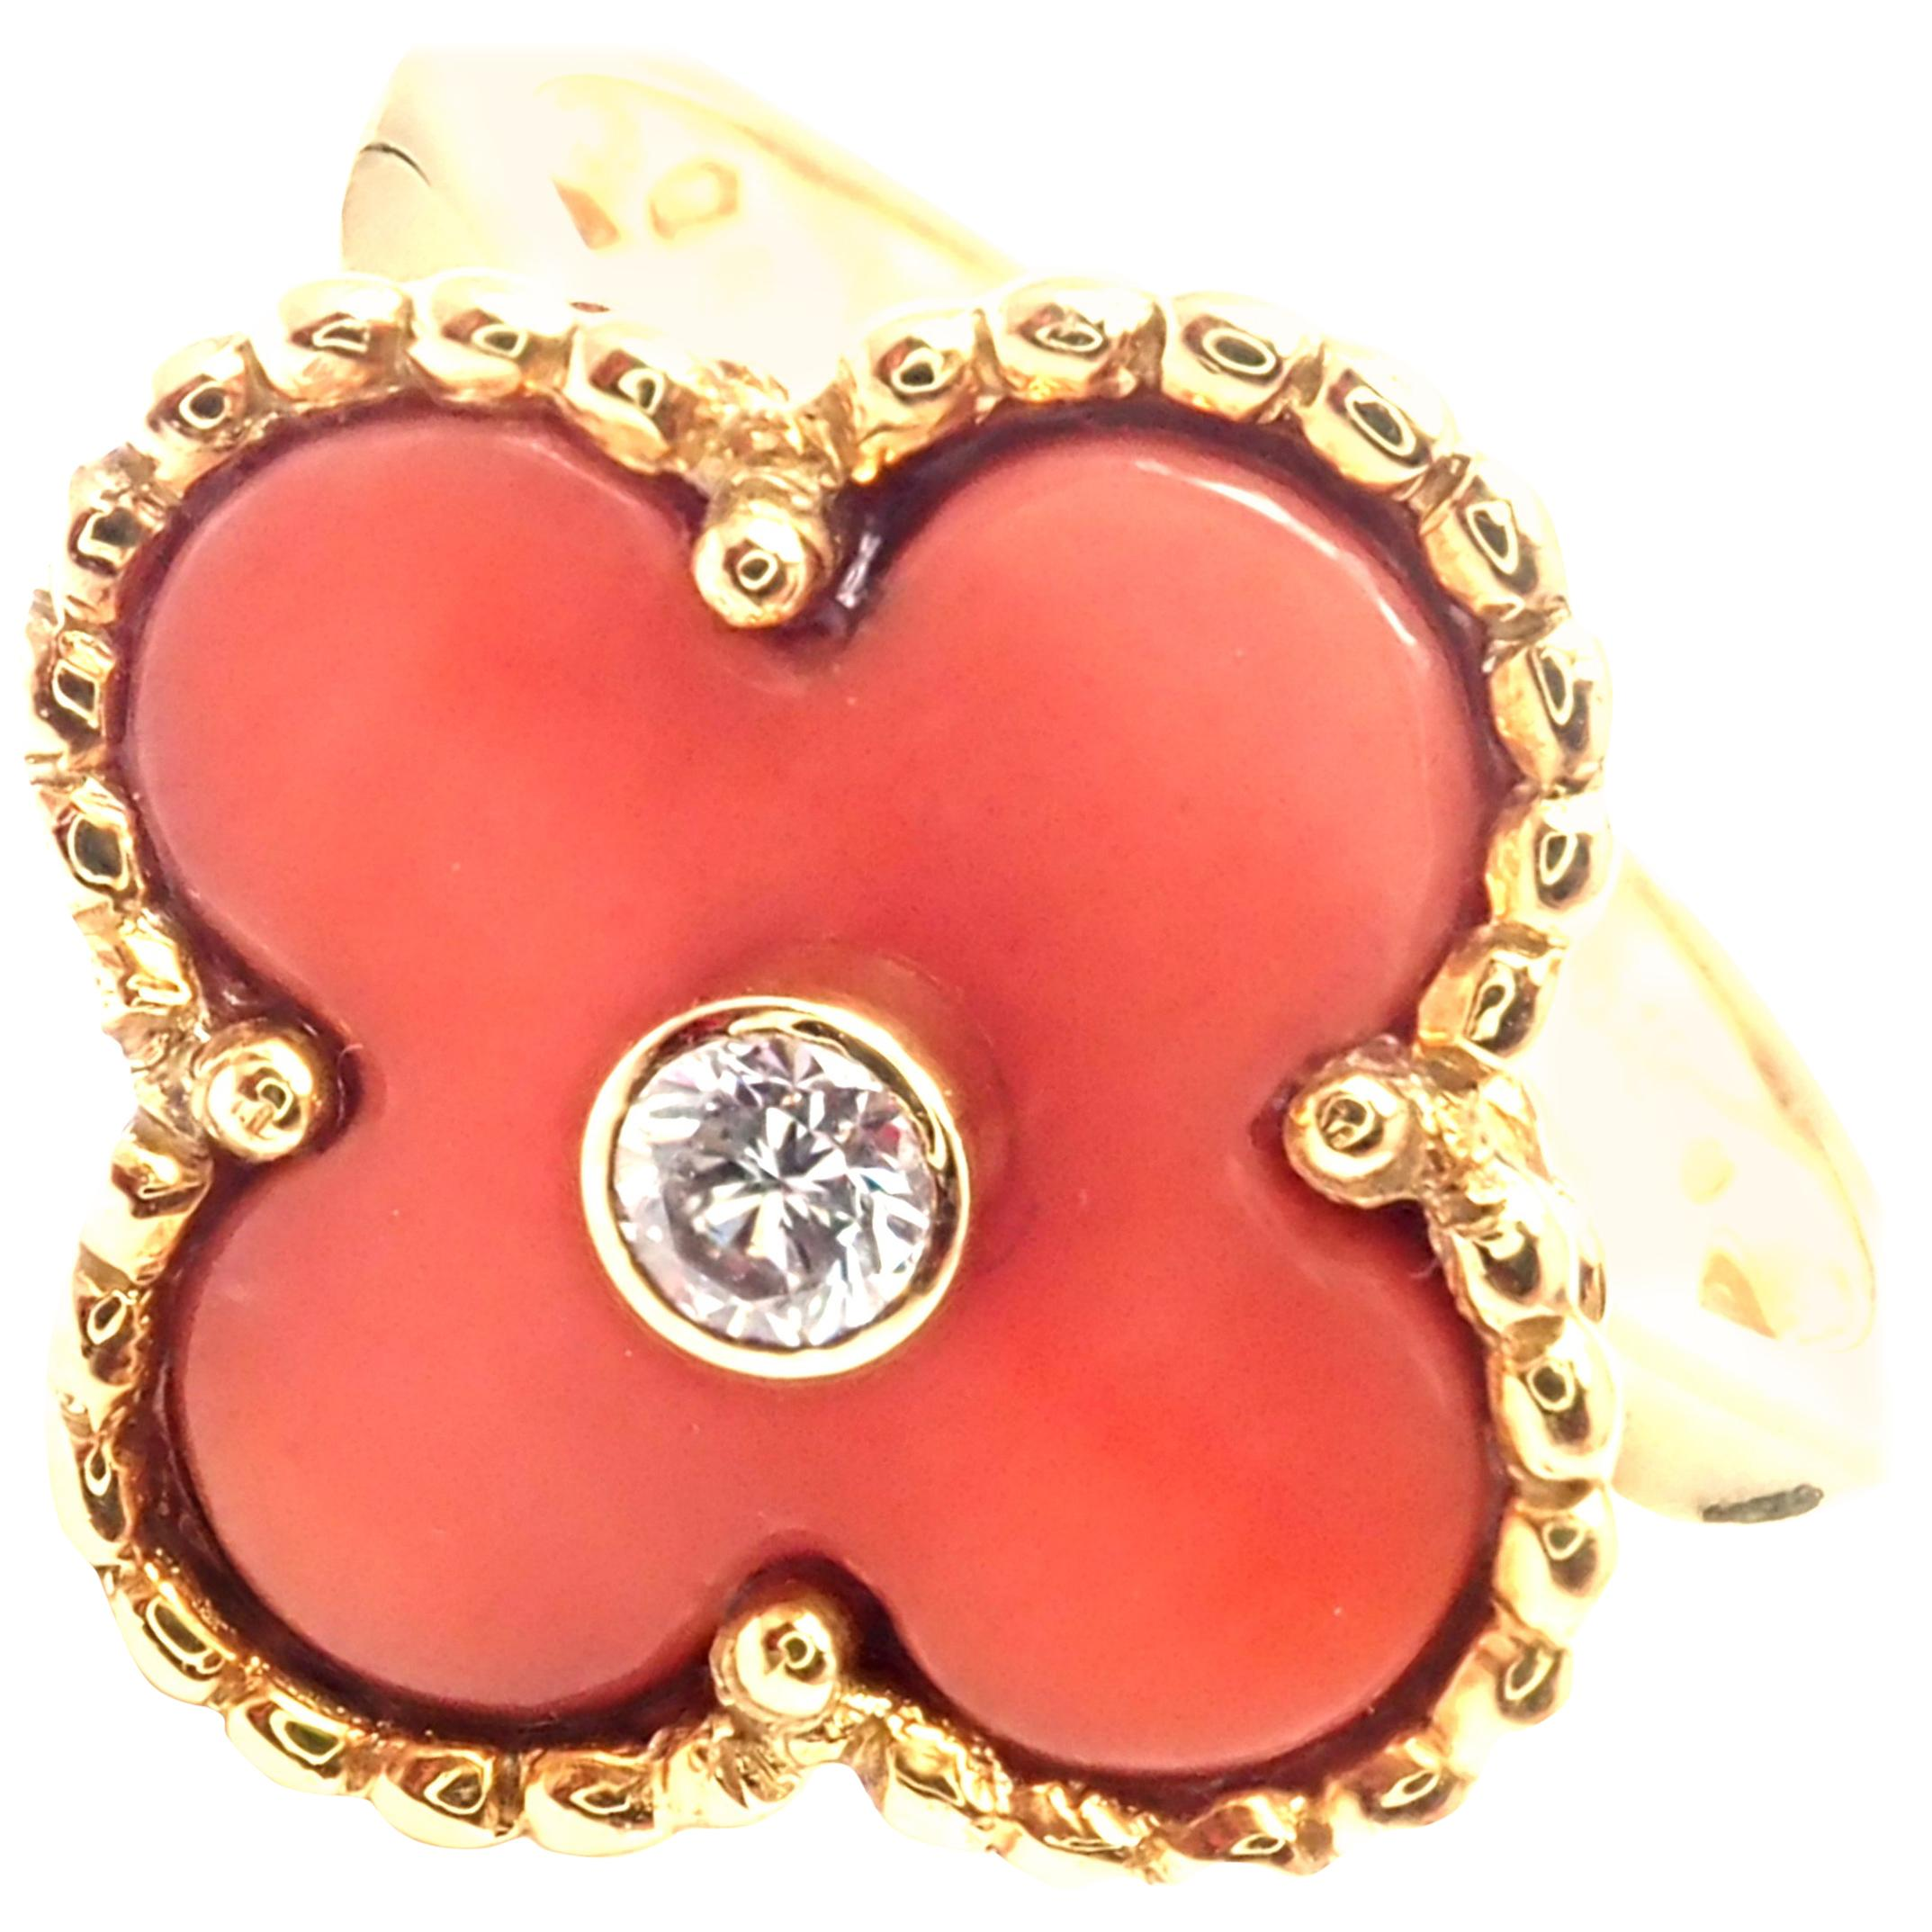 Van Cleef & Arpels Alhambra Coral Diamond Yellow Gold Ring